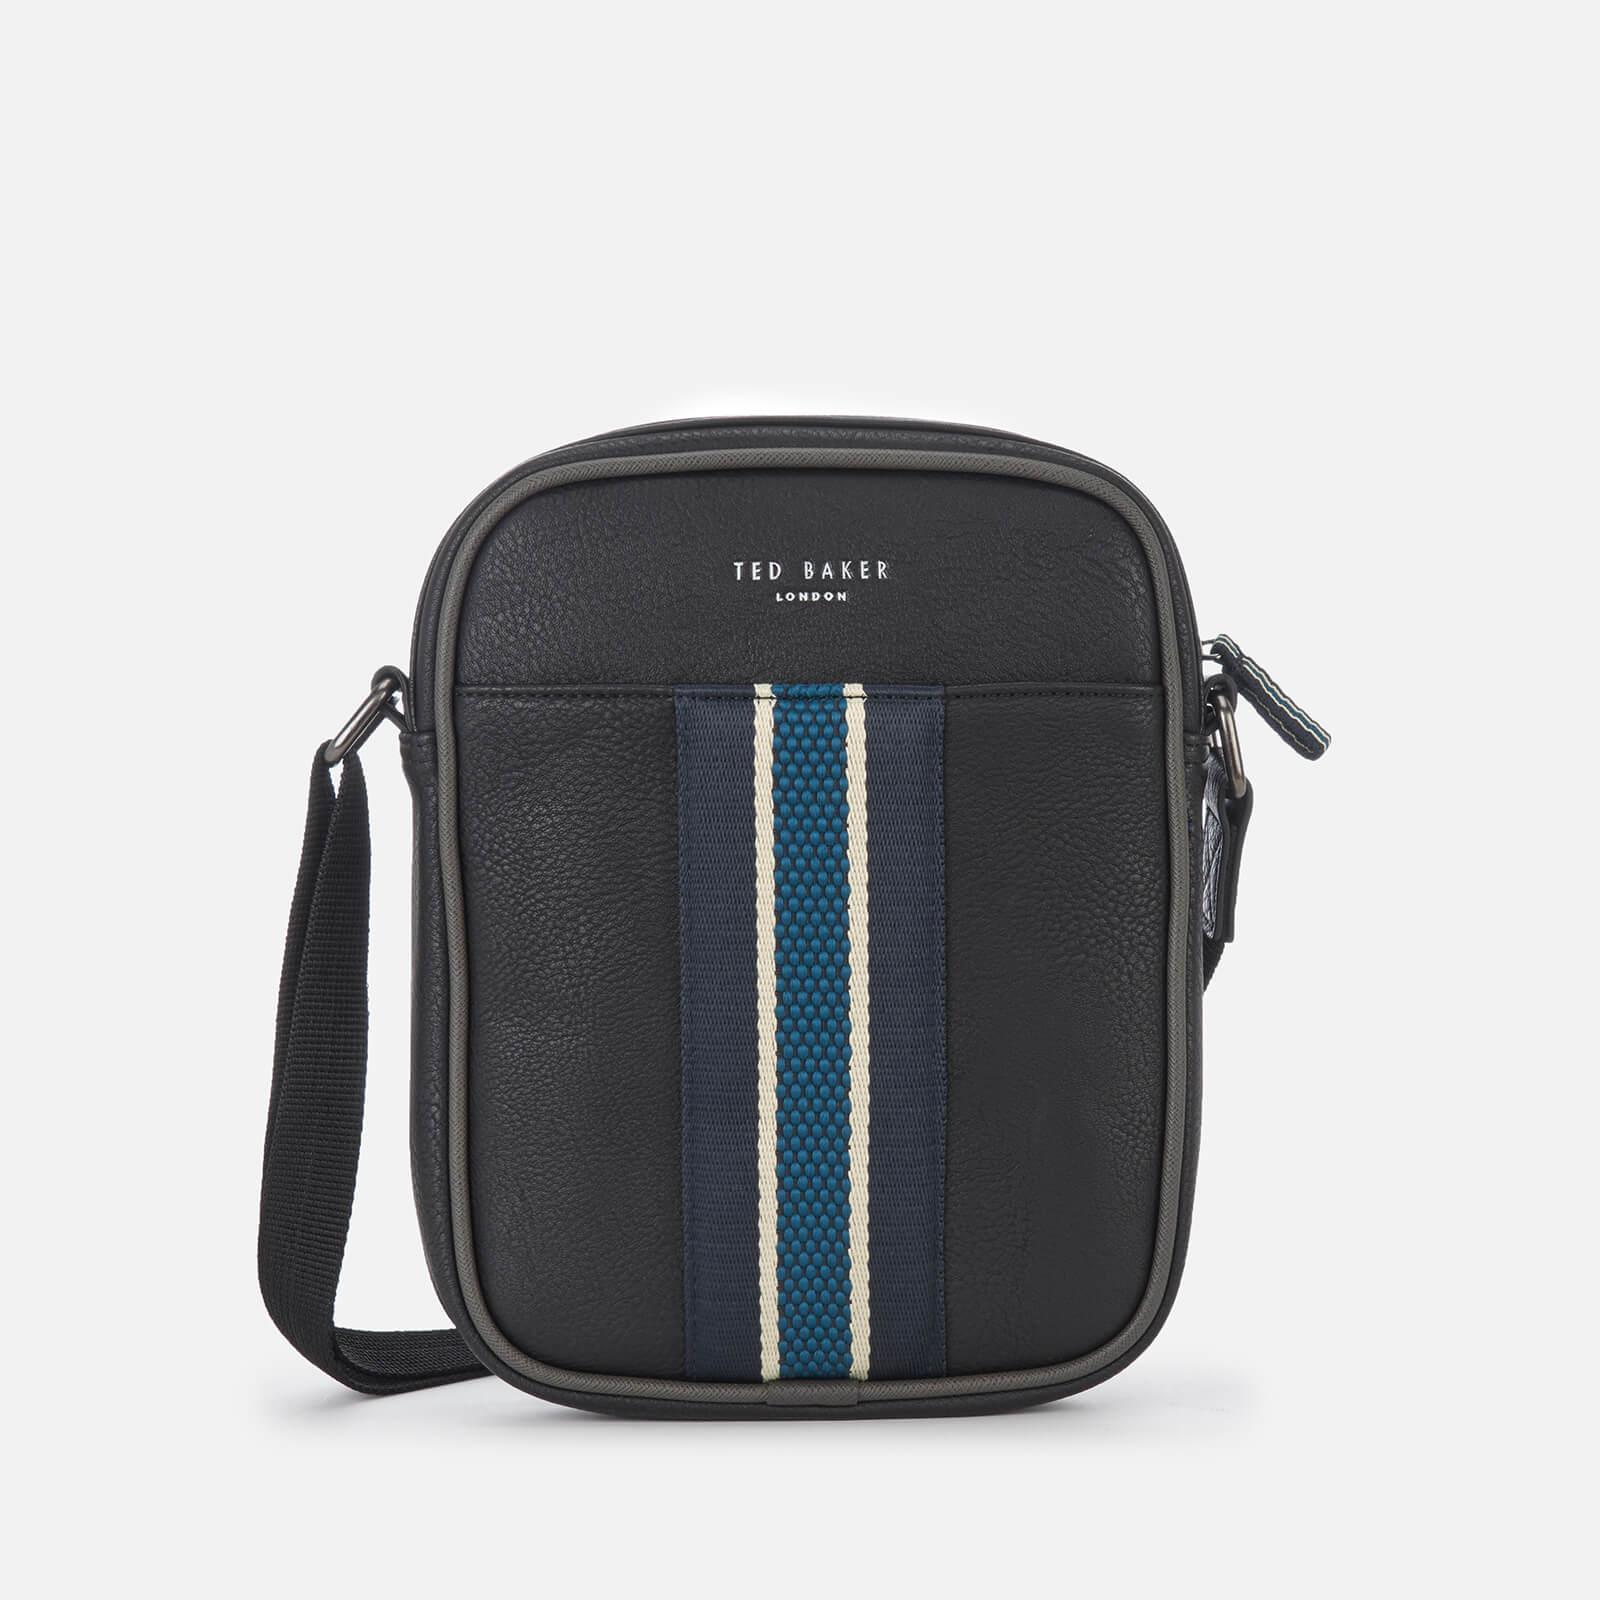 7e2b6d7cf8 Converse Cross Body Mini Bags Black - One Size 10003338-A01